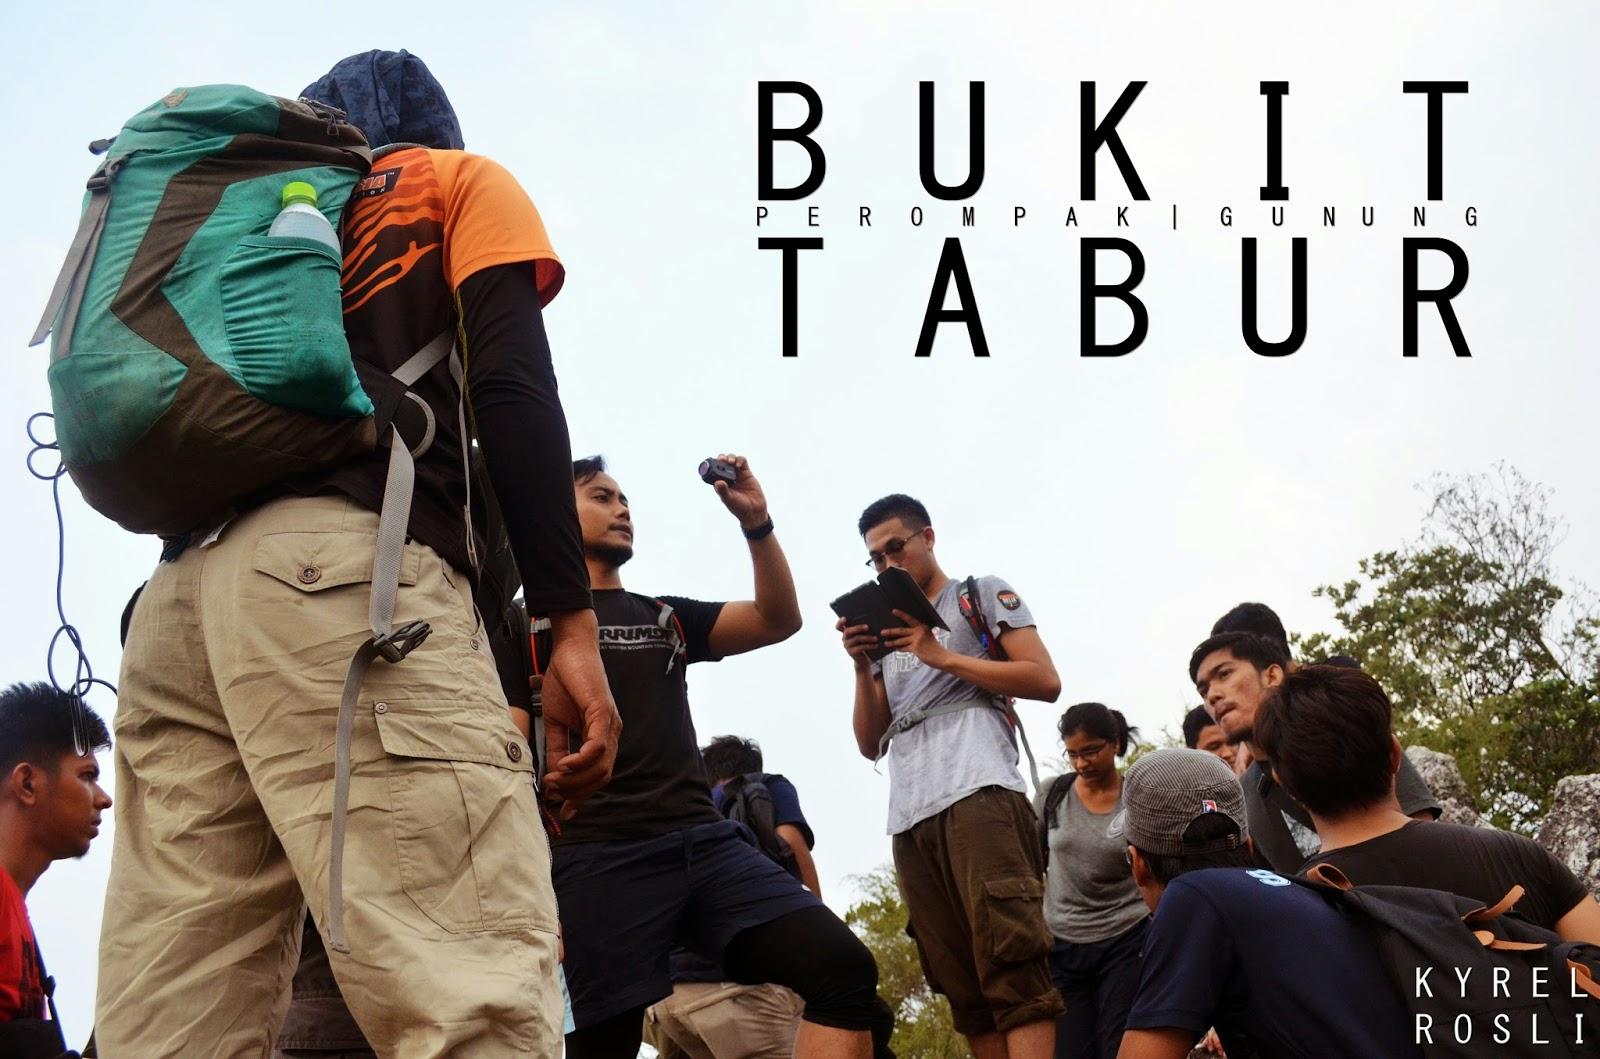 Bukit Tabur West Summit